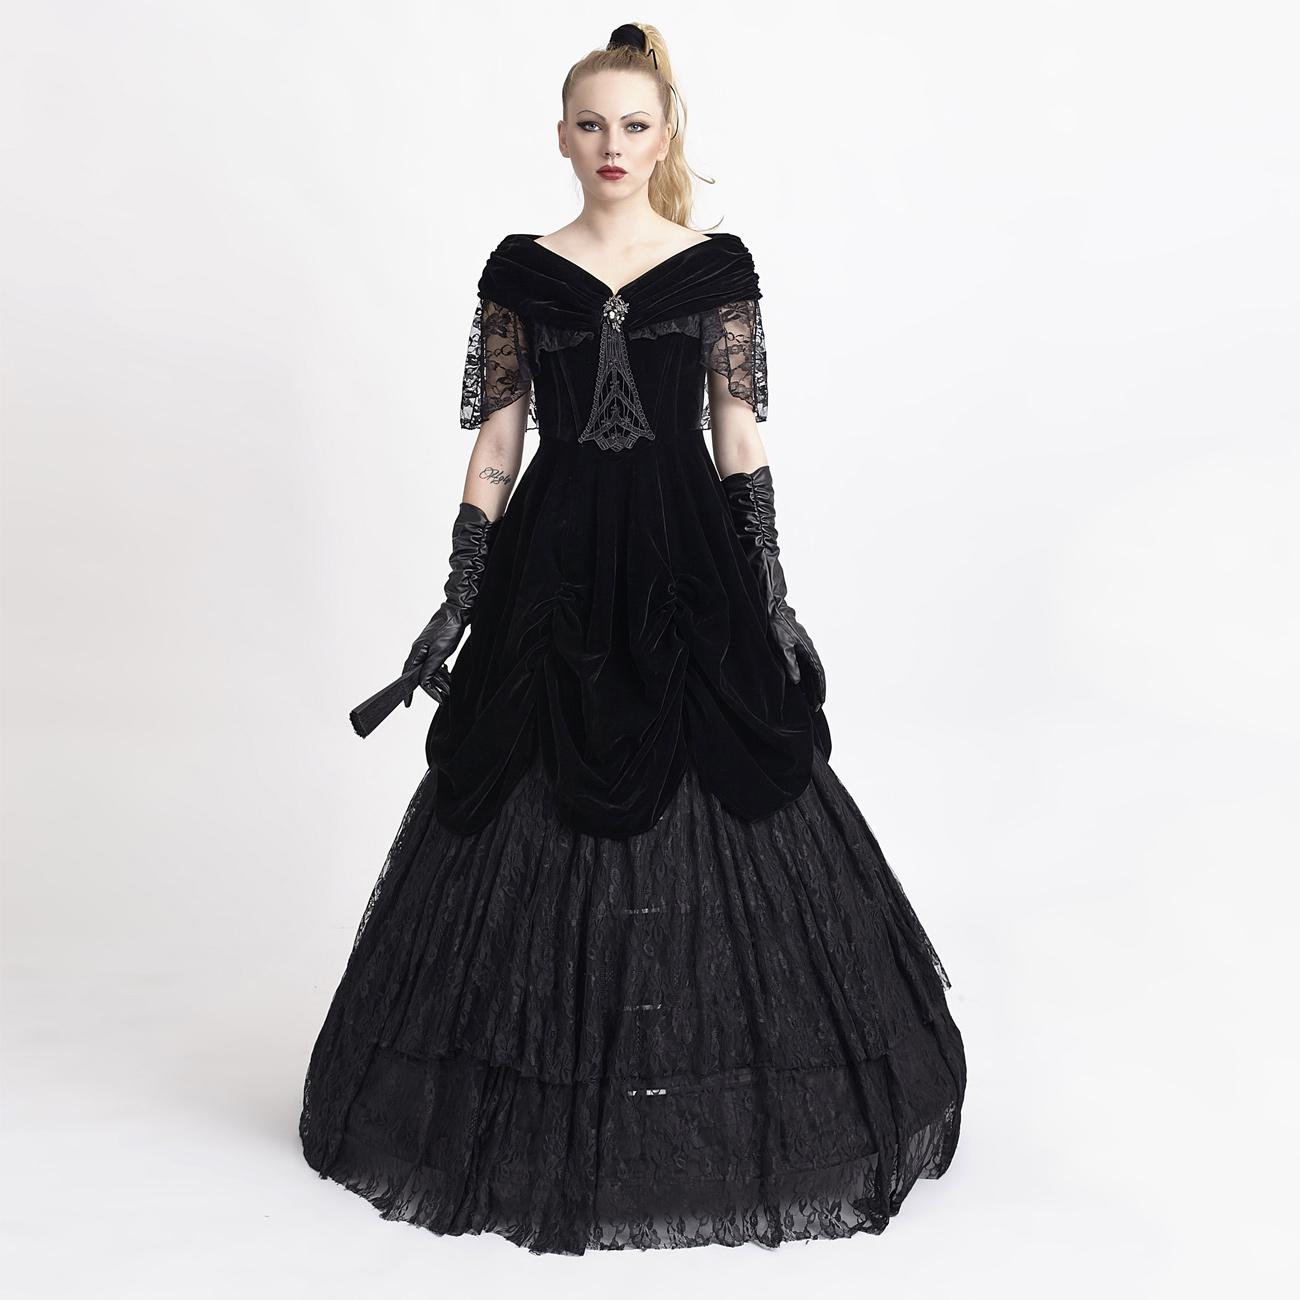 LADY DE LA MORTE: langes viktorianisches Samtkleid